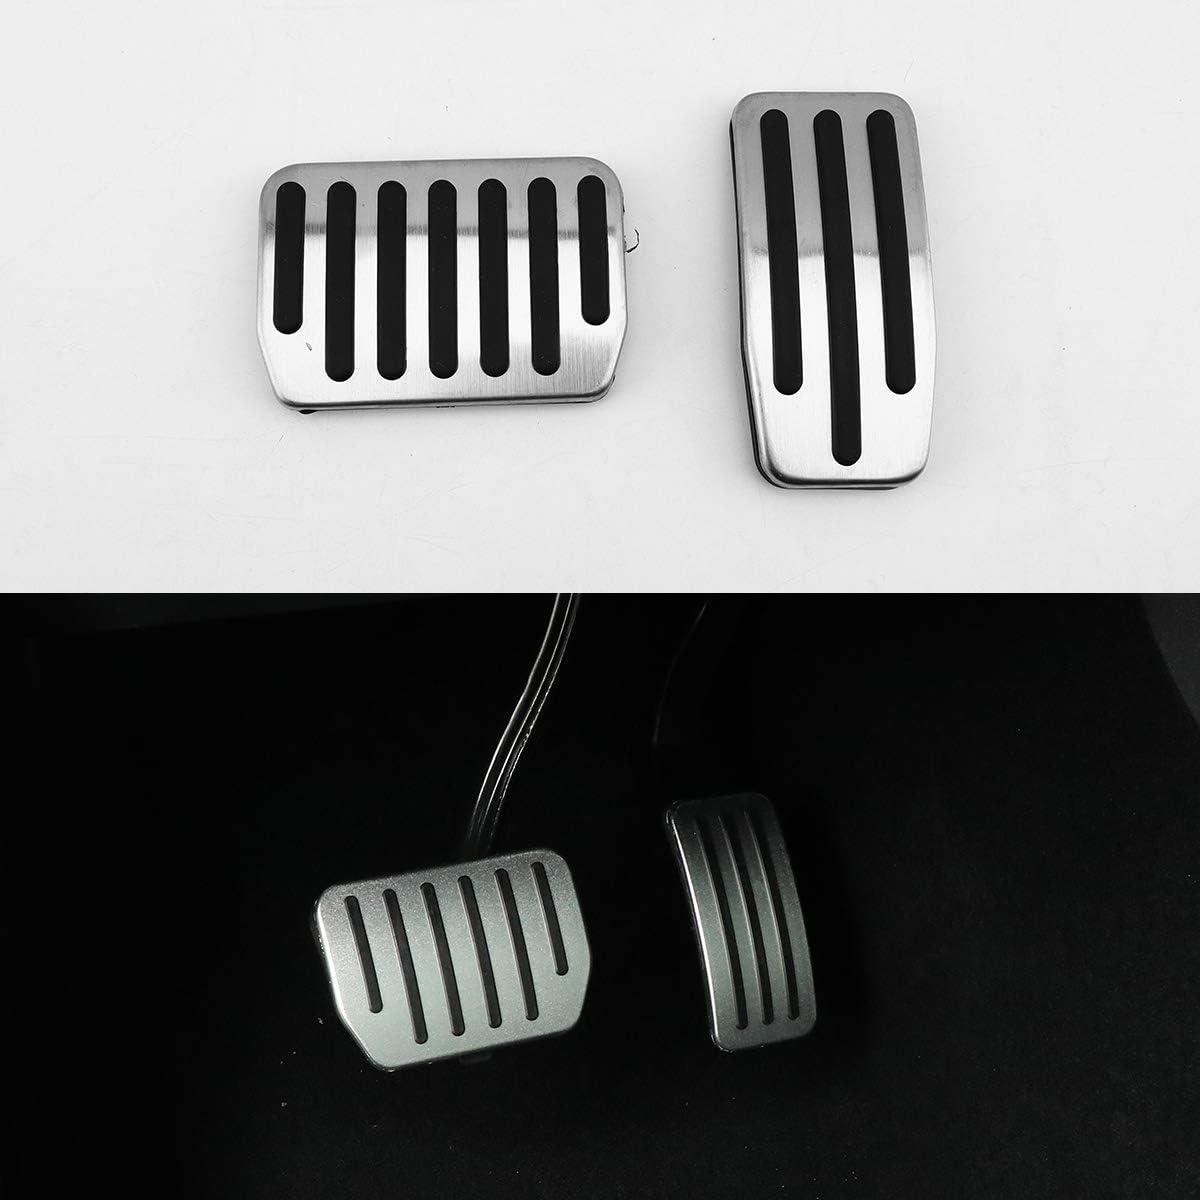 3pack Accelerator Gas /& Brake /& Foot Rest Foot Pedal Pads Anti-Slip Aluminum Foot Pedal Pads Cover Set for Tesla Model 3 Rest + brake + throttle